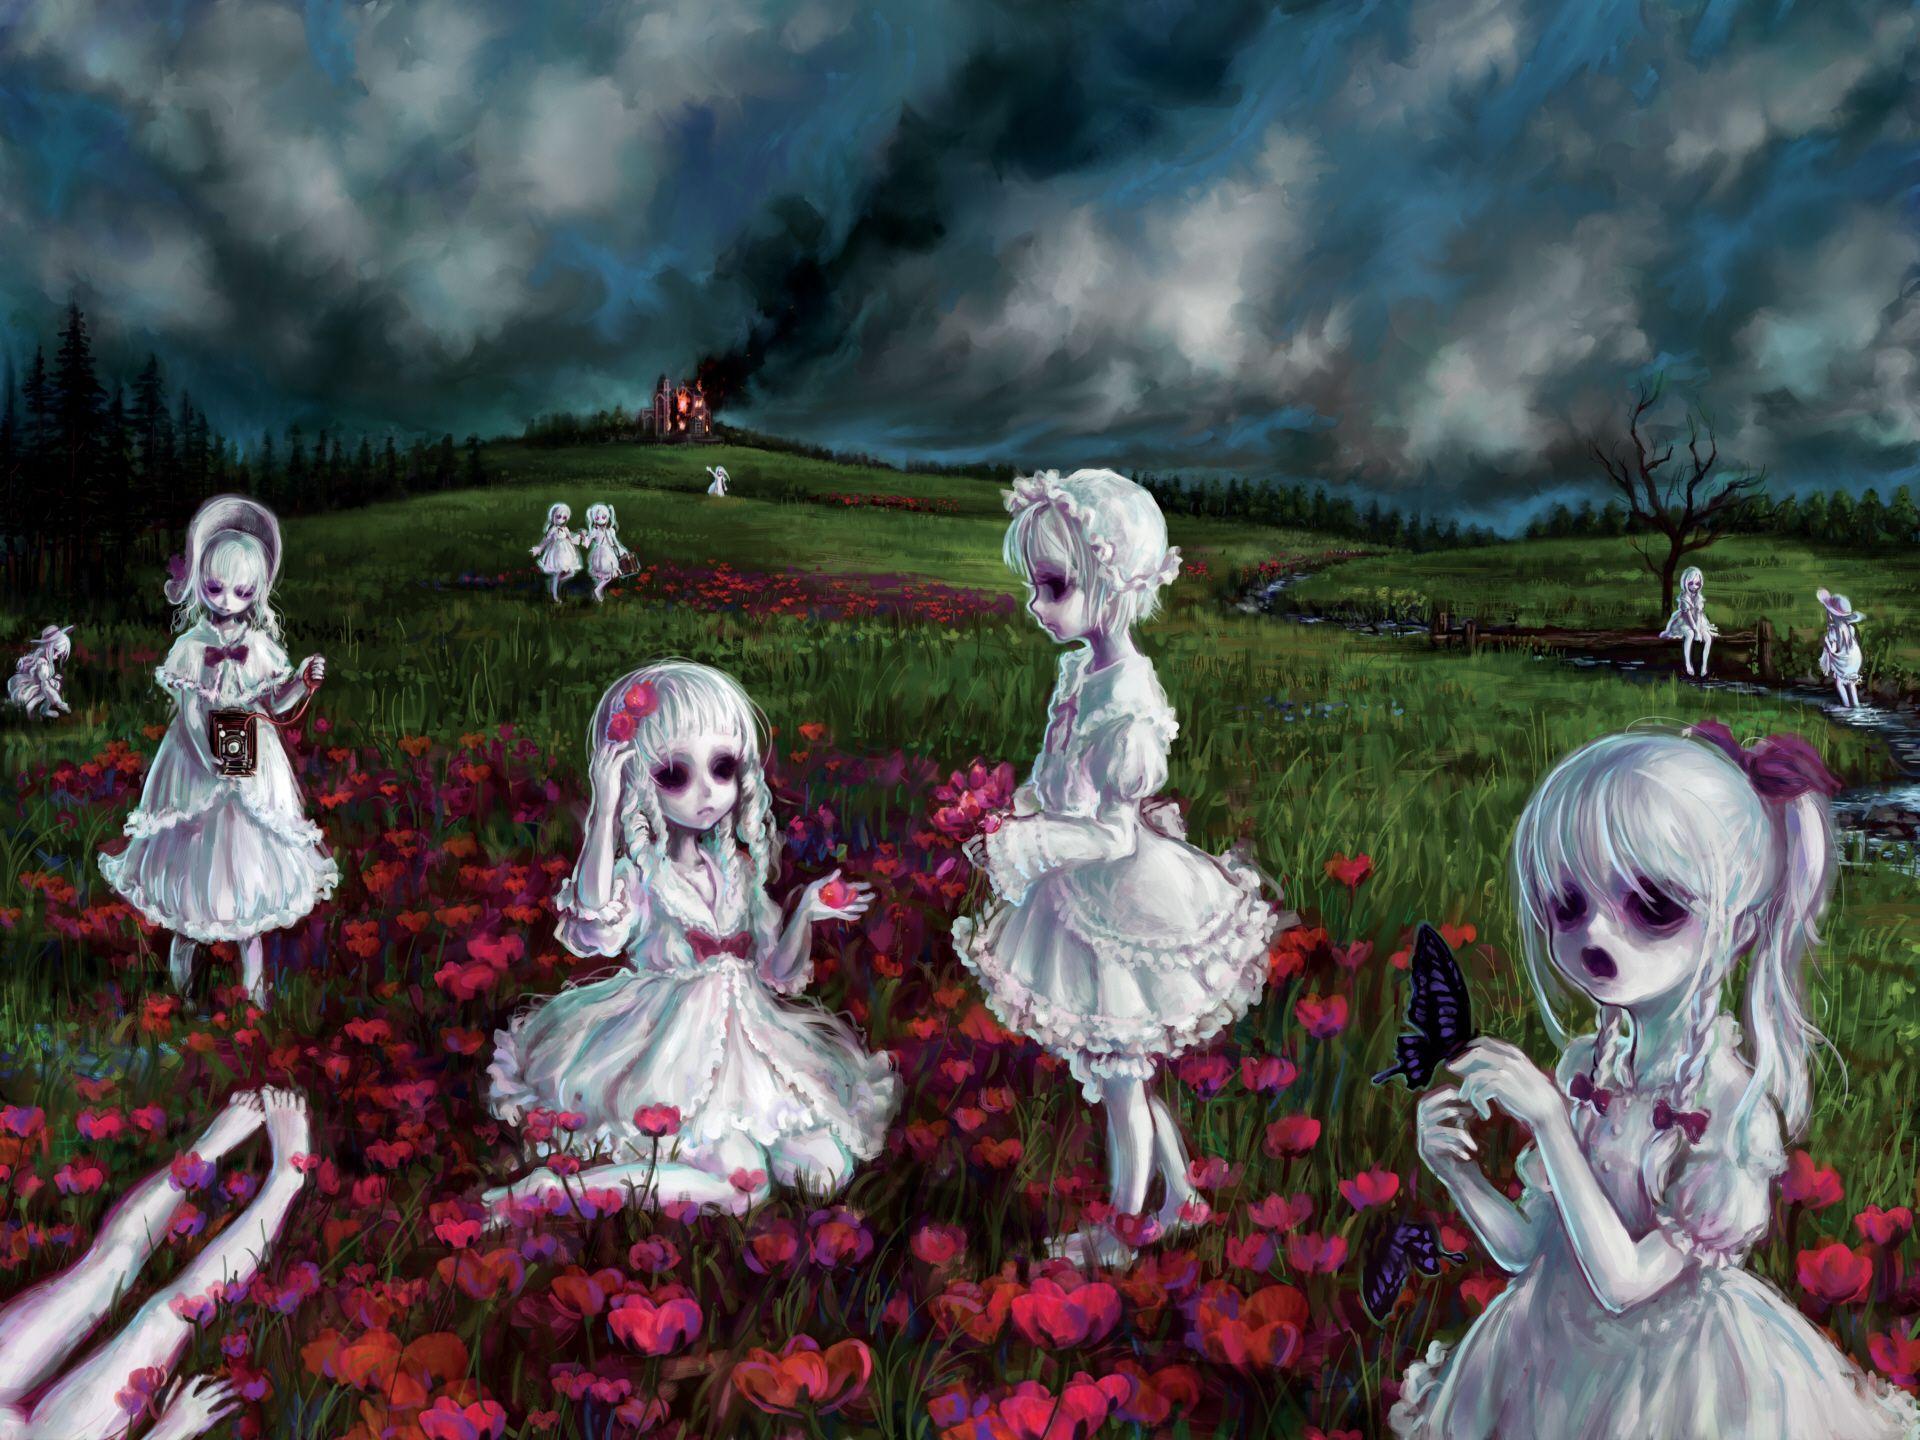 Little Zombie Girls Zombie Wallpaper Creepy Images Creepy Art